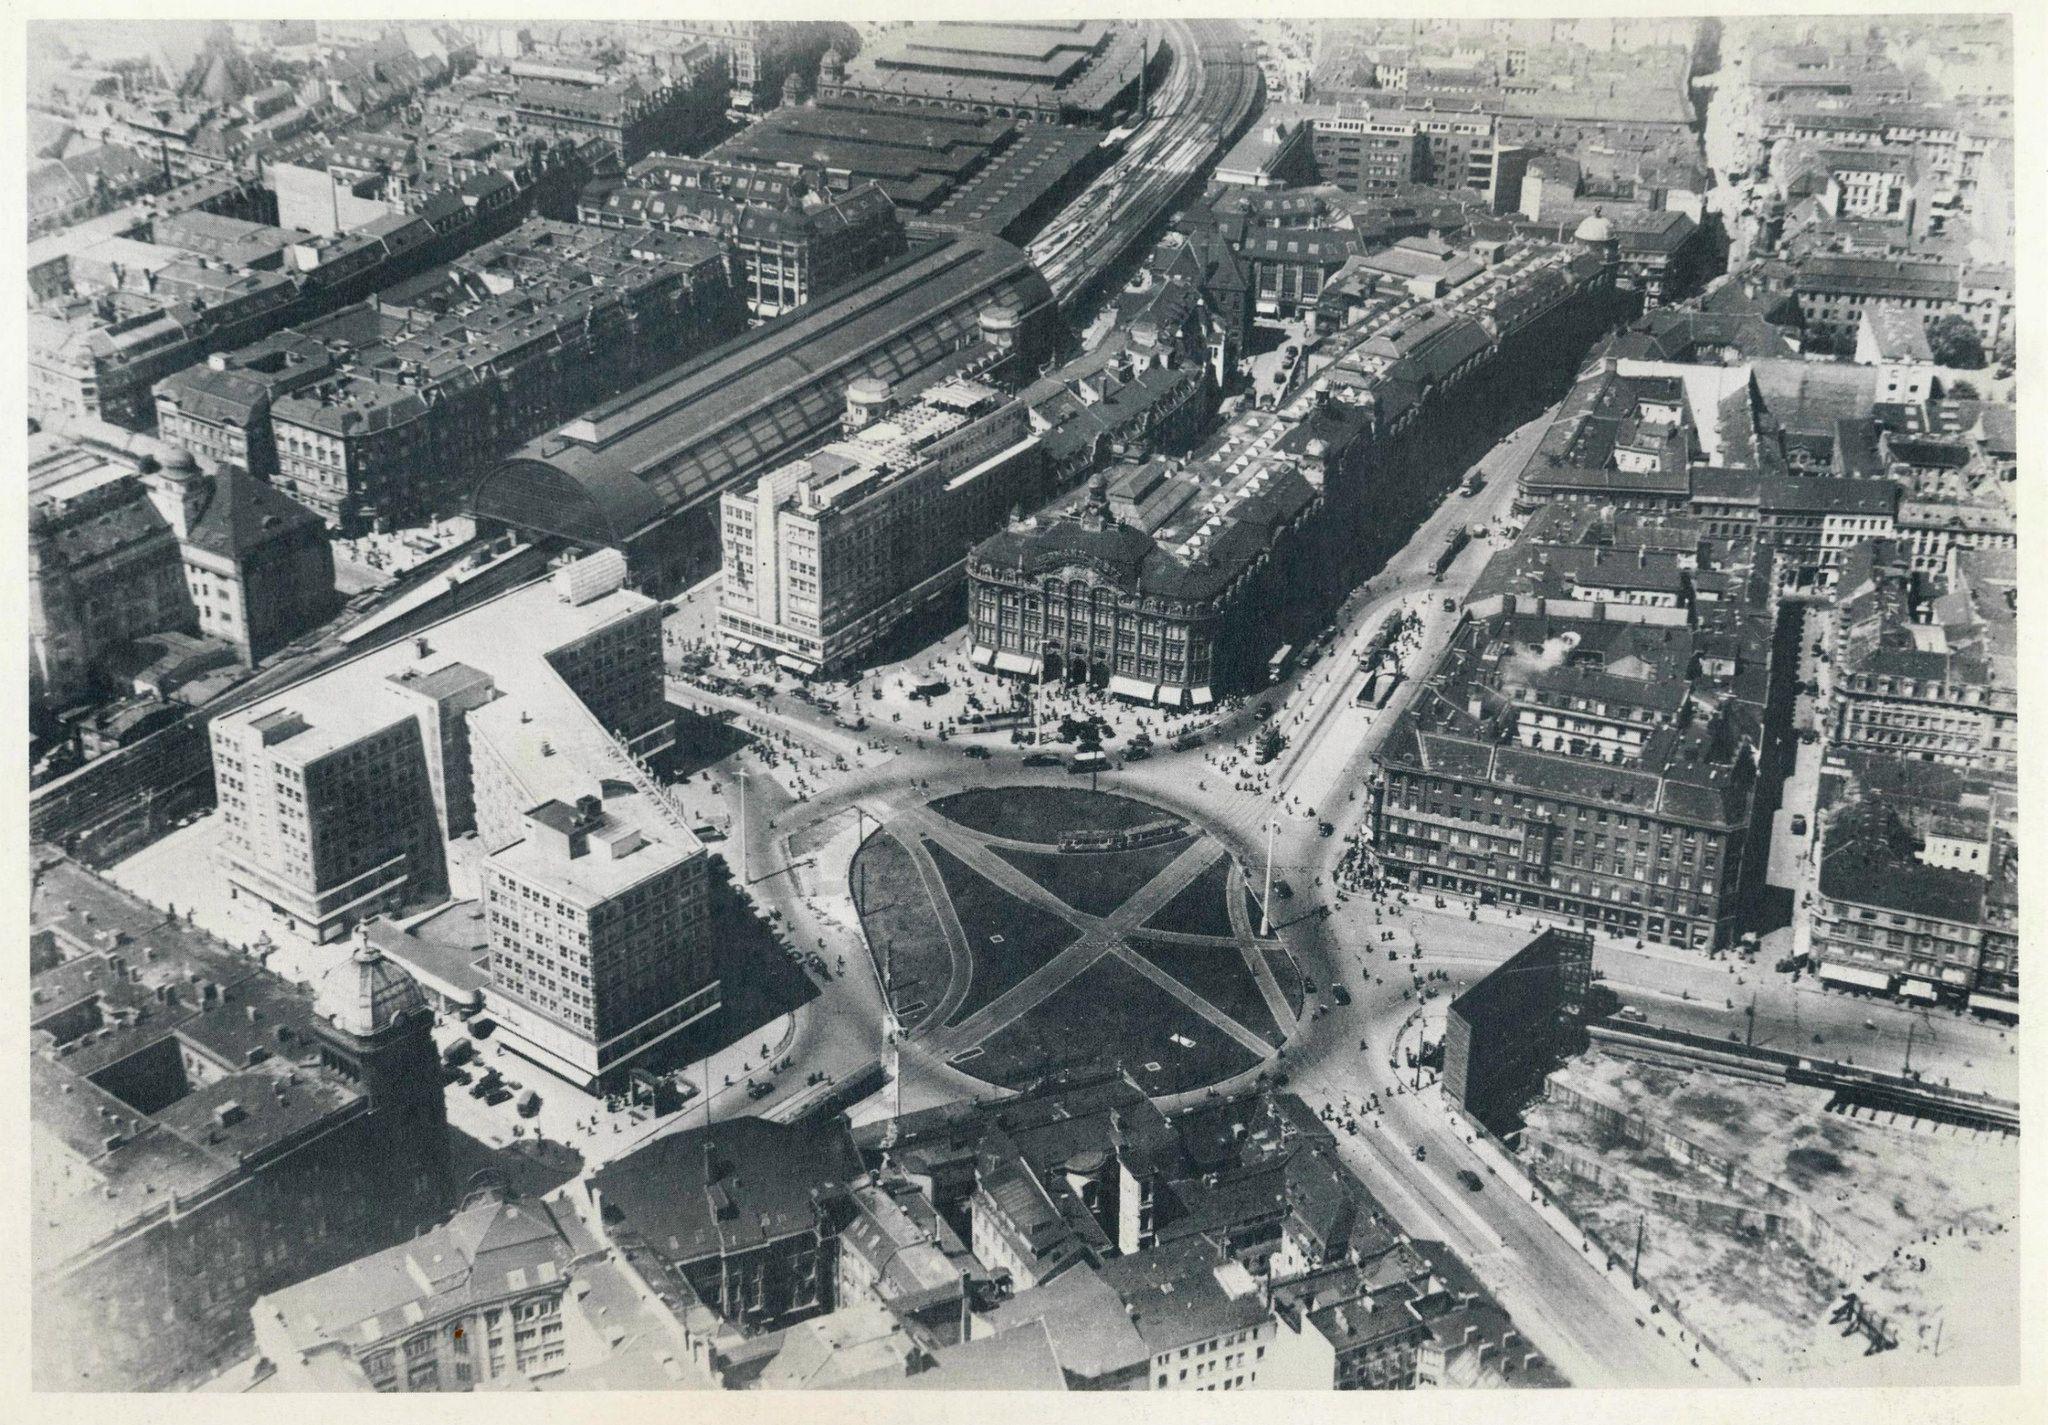 Historische Luftaufnahmen Berlin Alexanderplatz 1933 Berlin East Berlin Paris Skyline